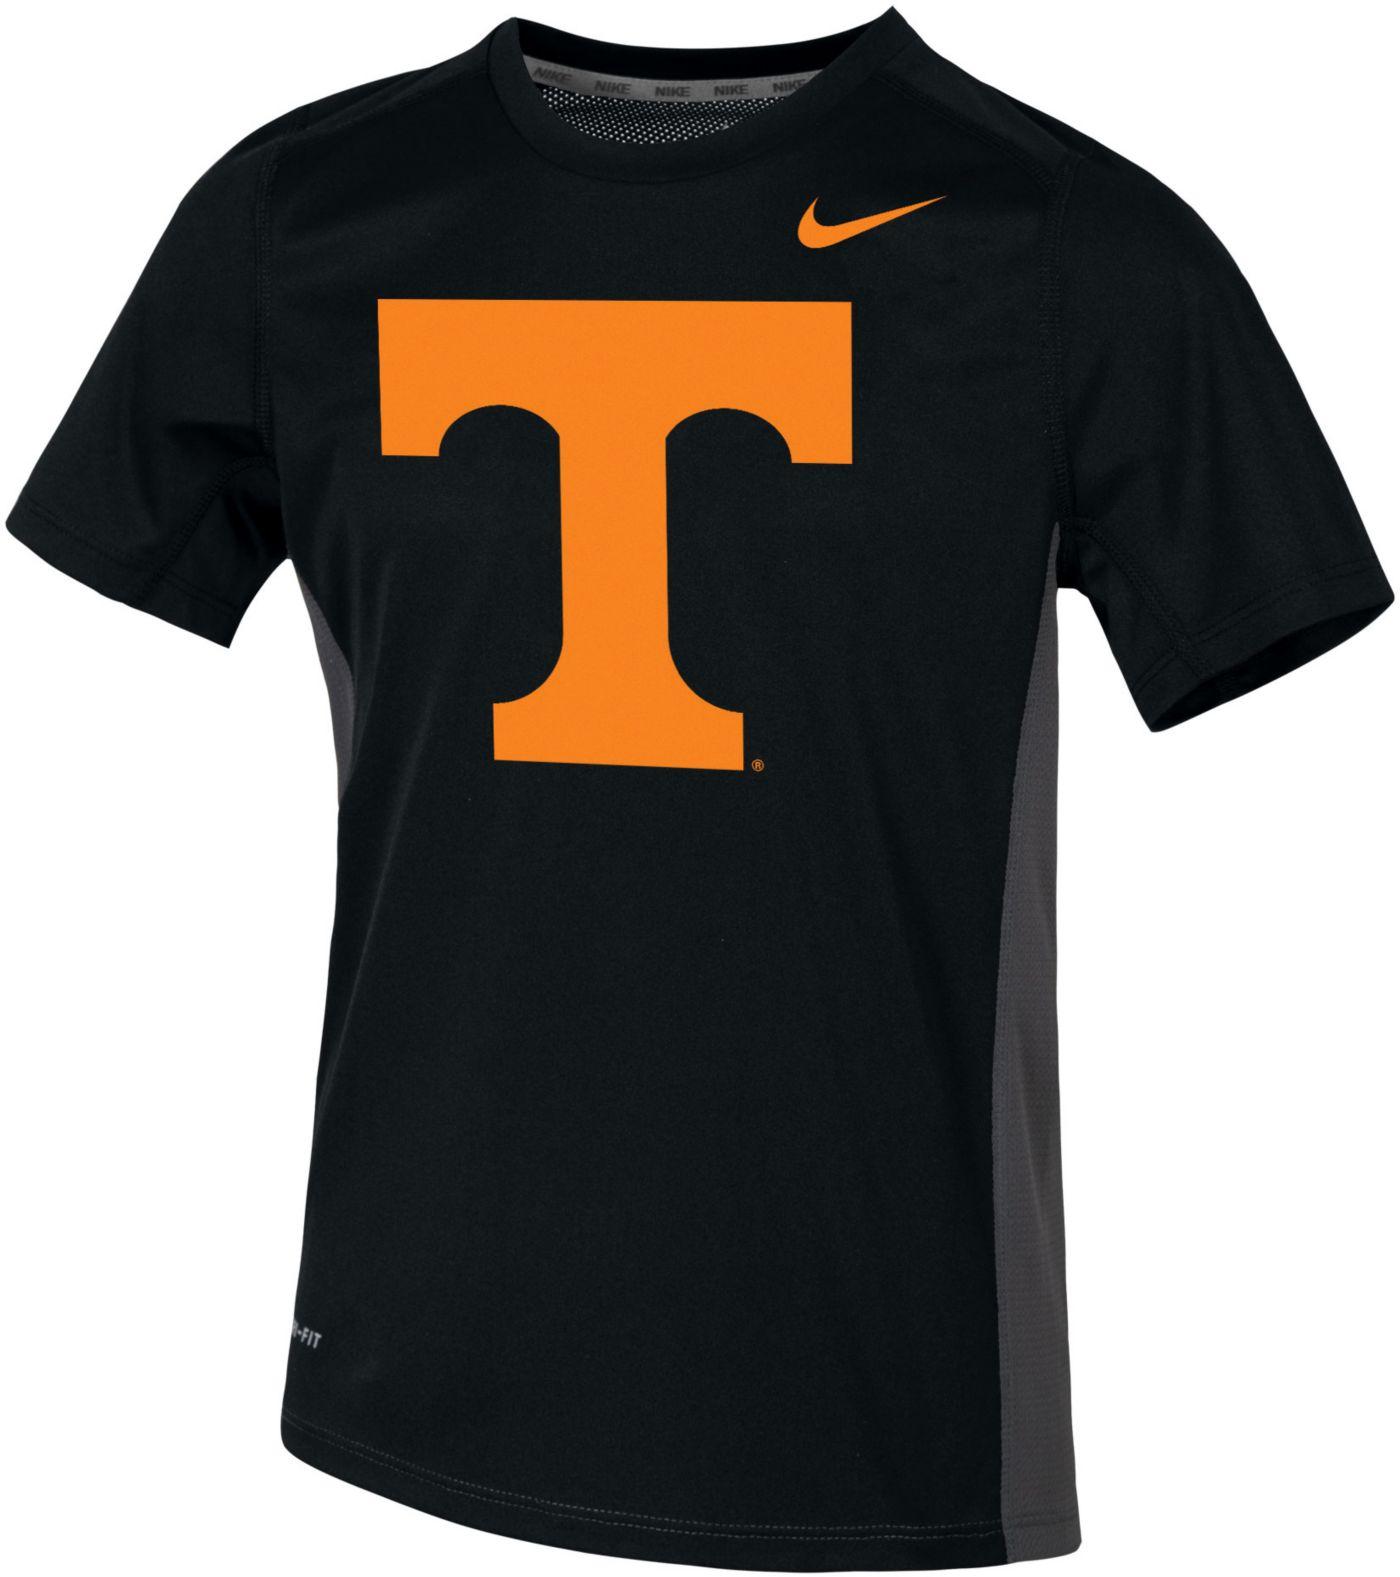 Nike Youth Tennessee Volunteers Dri-FIT Miler Black T-Shirt